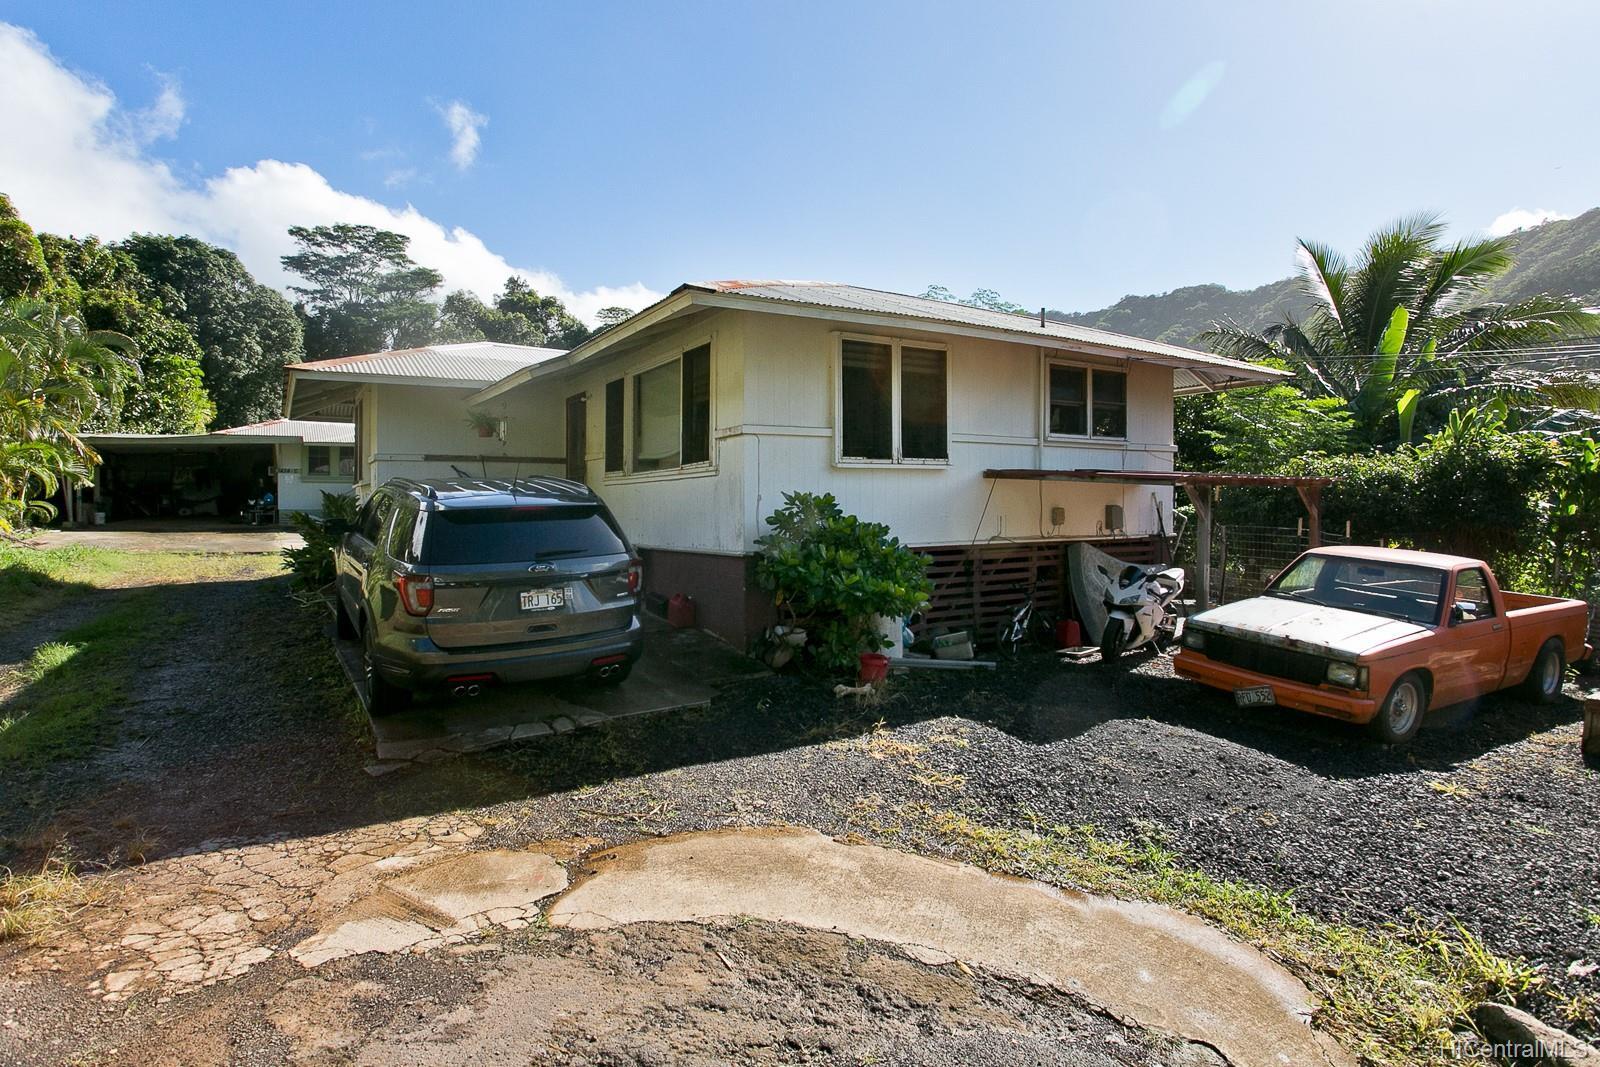 3434 Kalihi Street Honolulu - Multi-family - photo 14 of 20